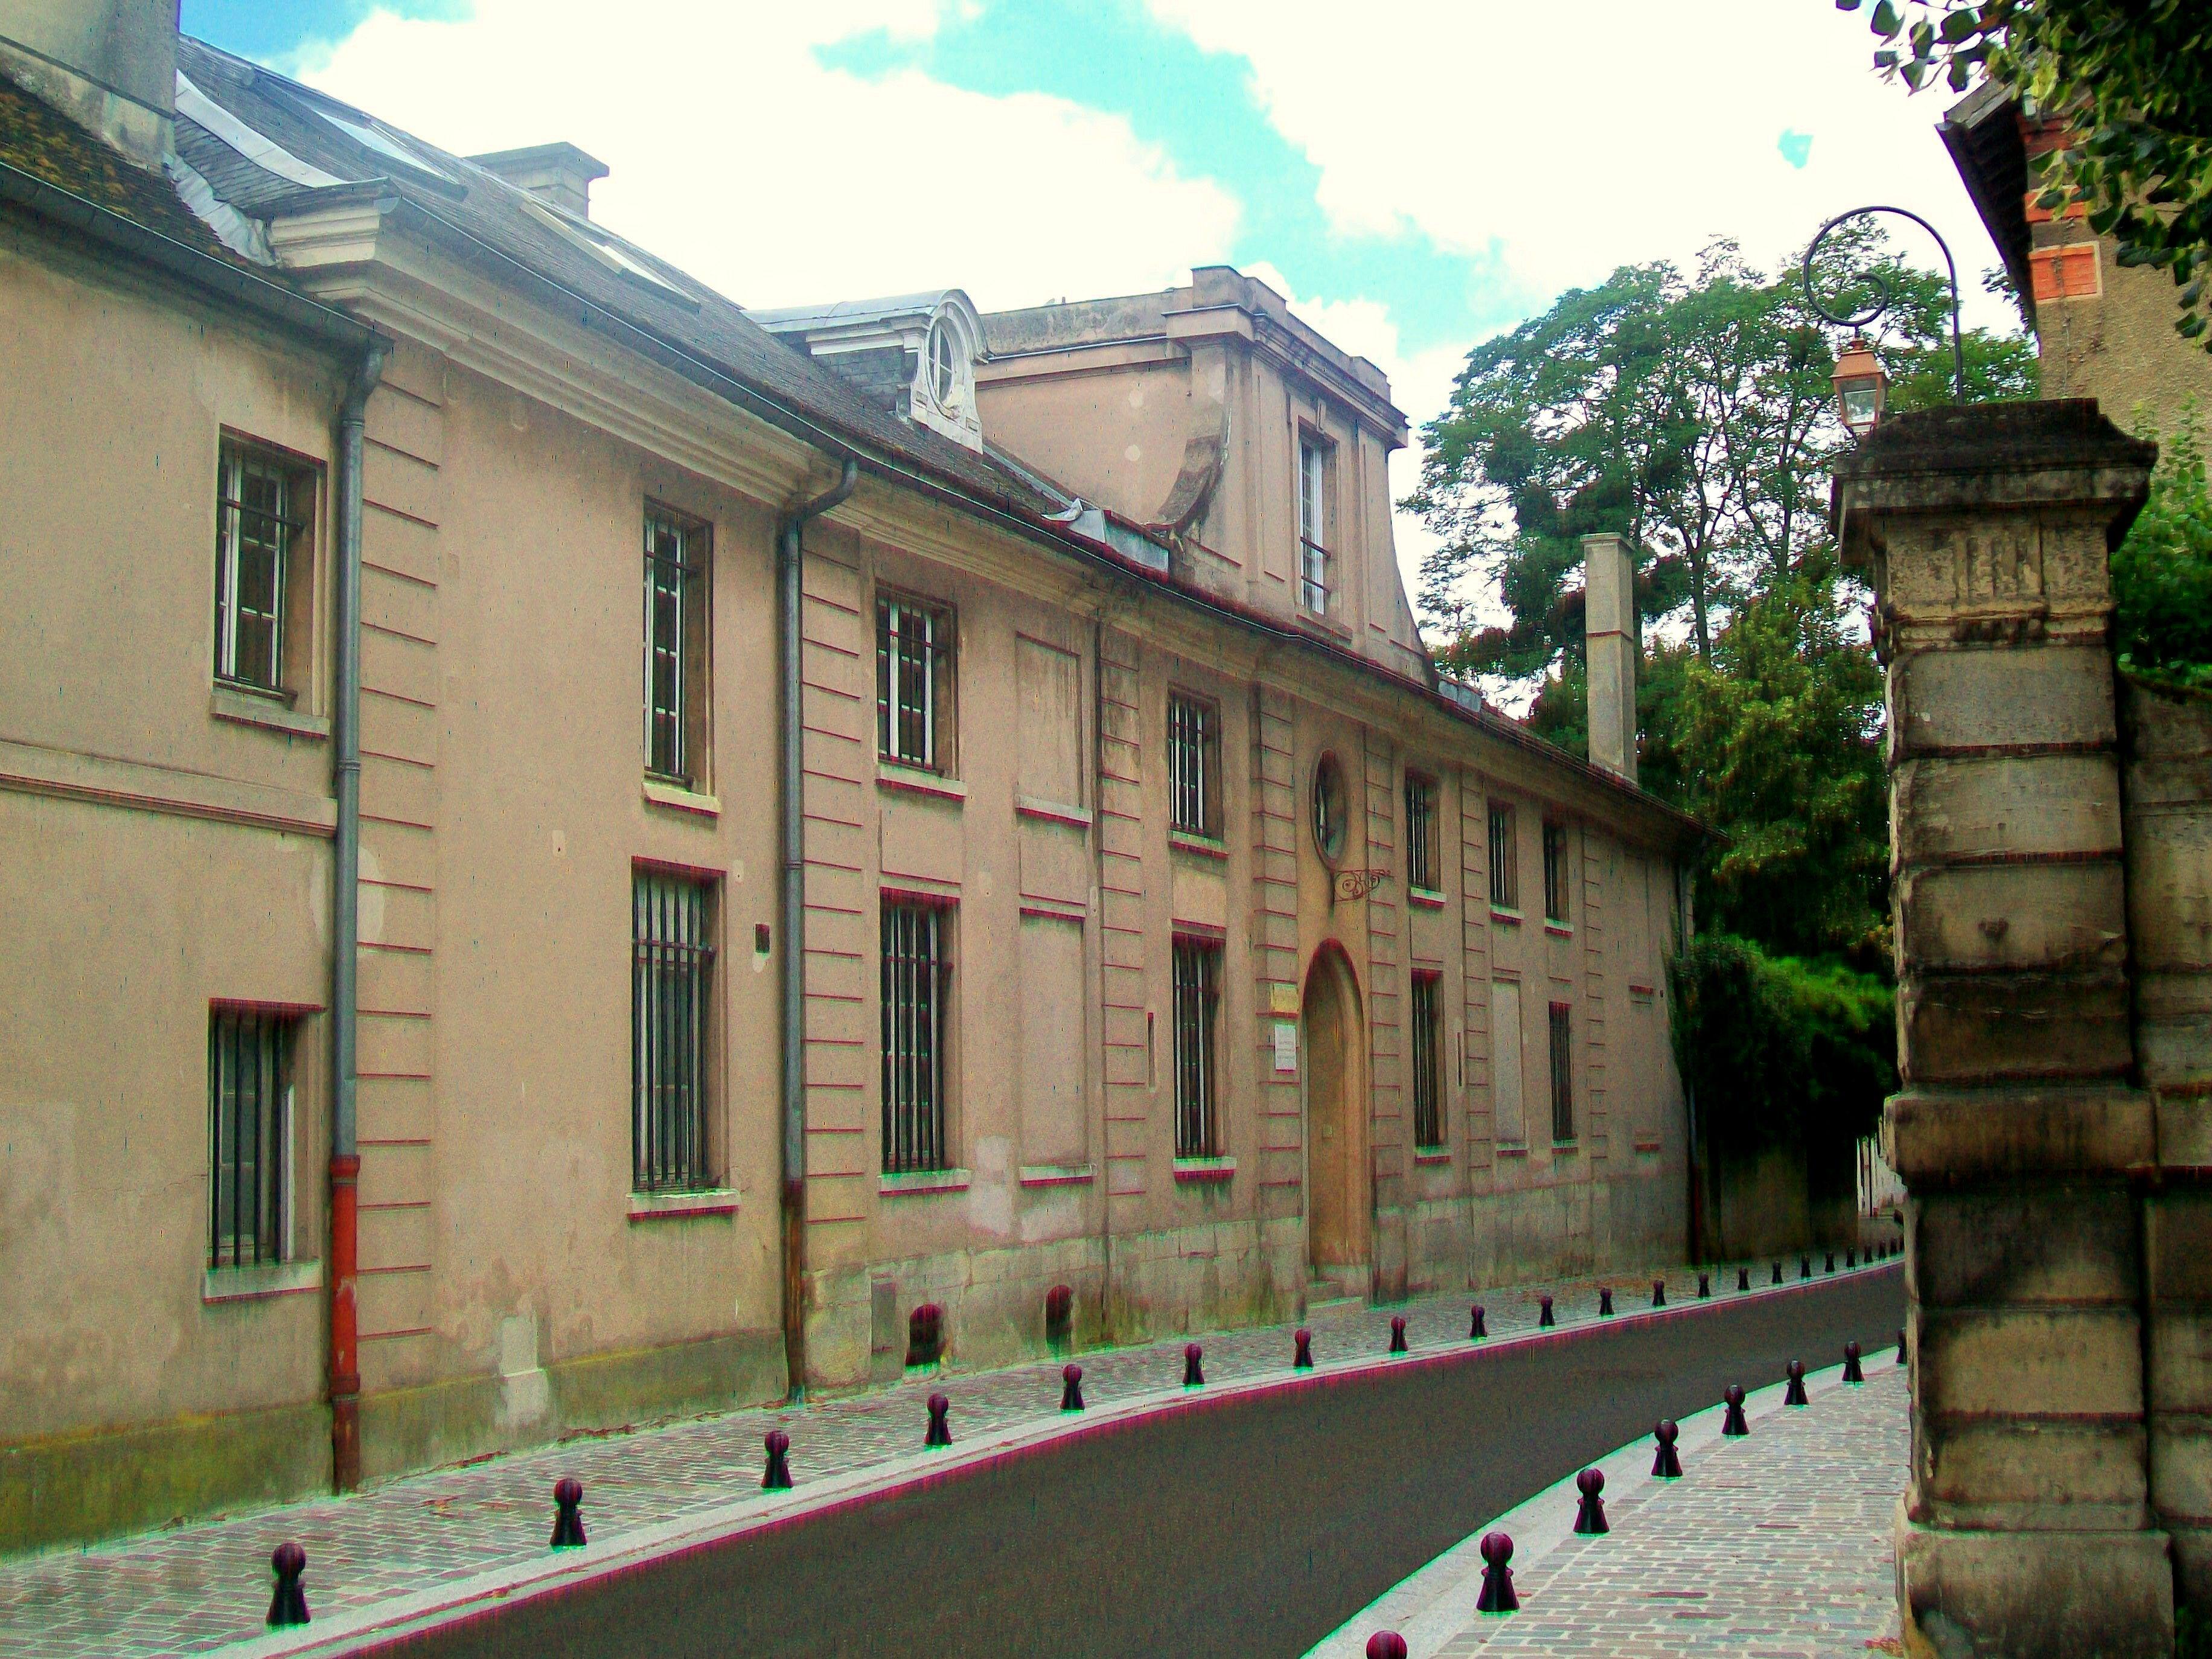 file brice sous for 234 t 95 pavillon colombe mh 1 15 rue edith wharton jpg wikimedia